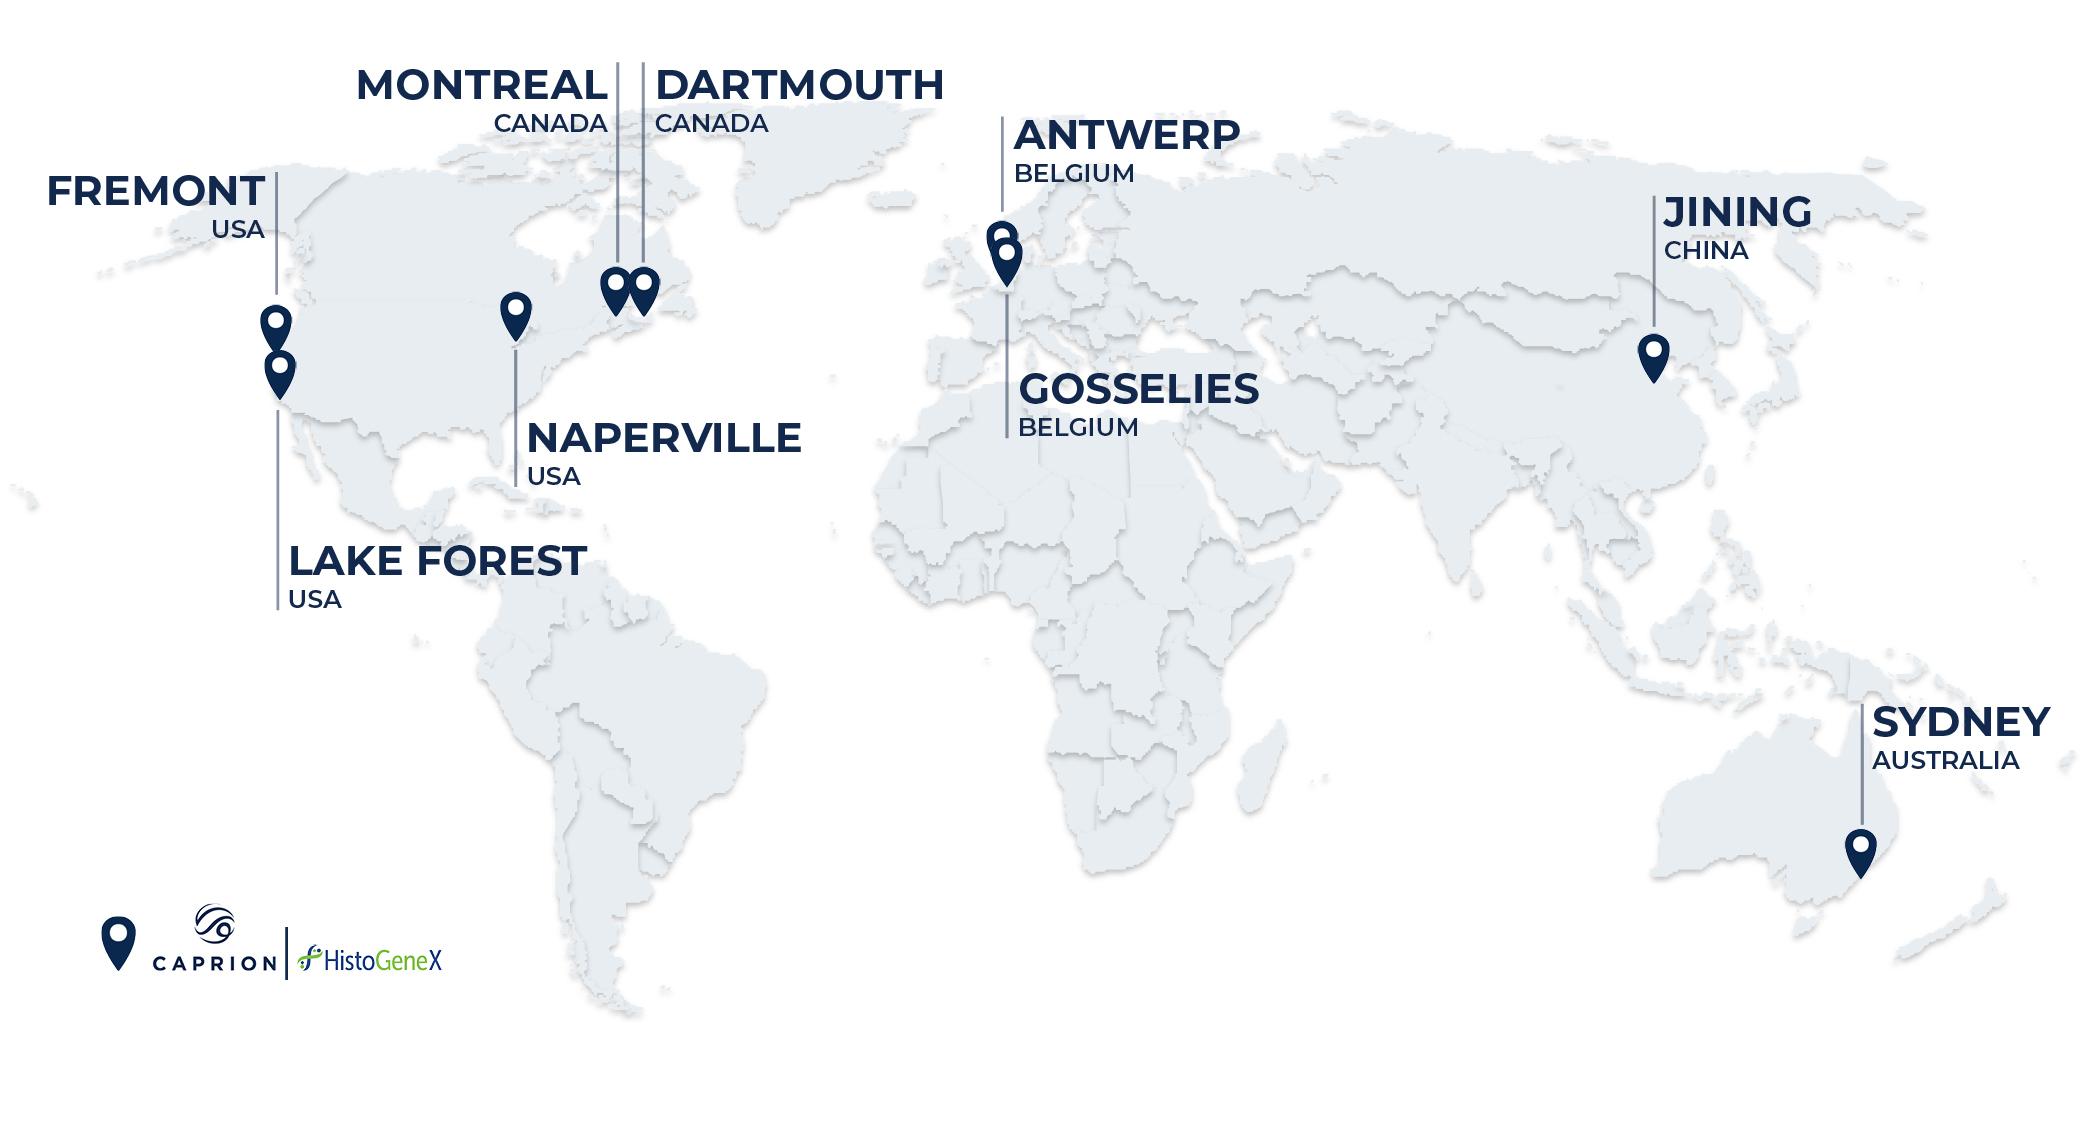 CAPRION-HGX_World Map 2021_CLI-MOSAIC-HiRez